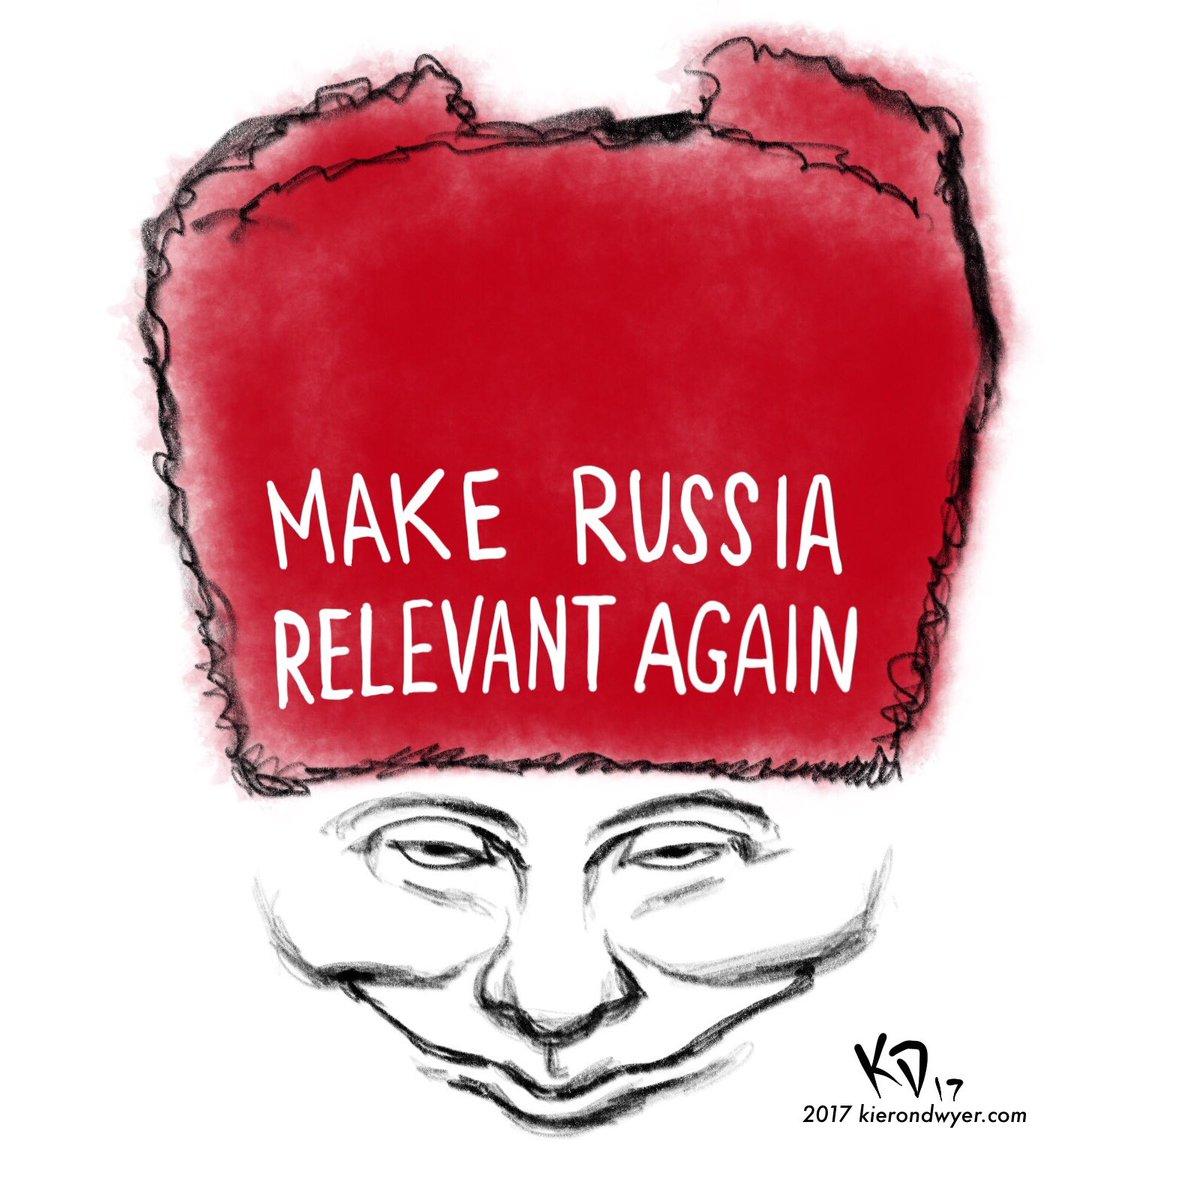 Traitors: #POTUS #VP #Flynn #Bannon #Reince #PaulManafort #Chaffetz #Kellyanne #MitchMcConnell #RandPaul #Tillerson #PutinOnTheShitz <br>http://pic.twitter.com/983WktUCtG